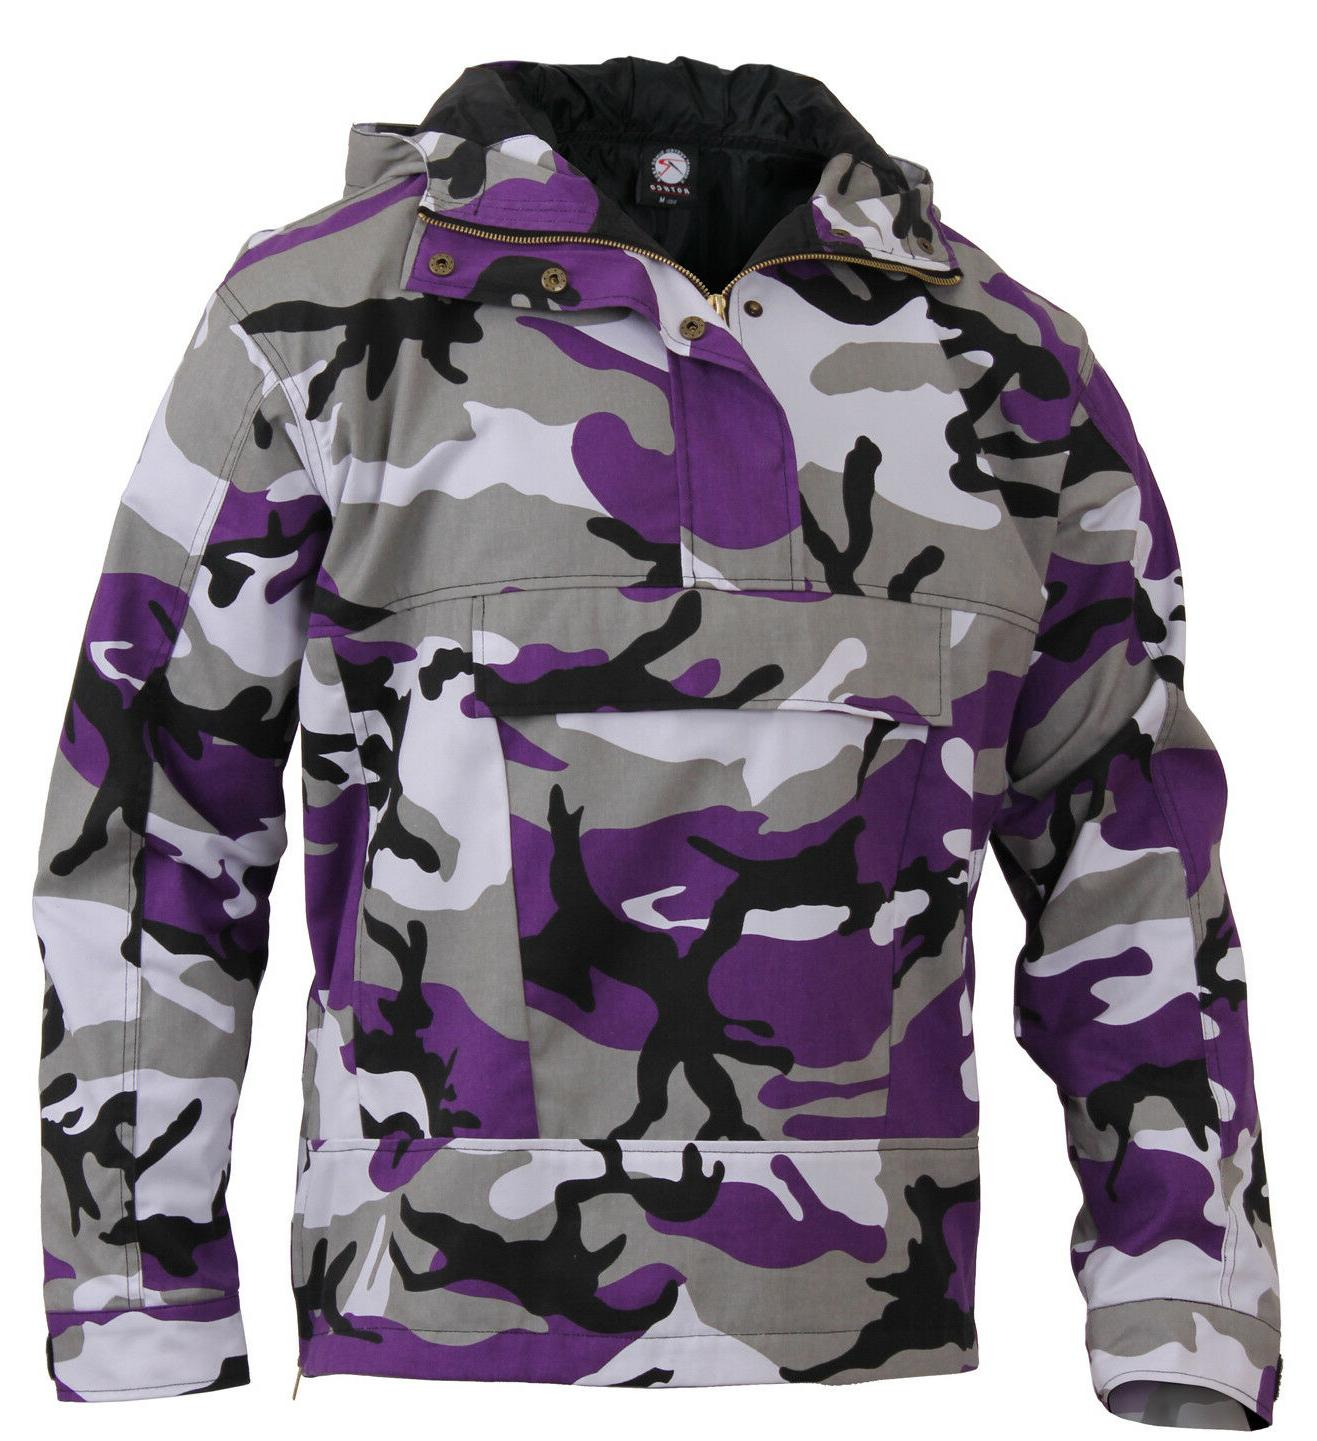 Mens Ultra Violet Camo Anorak Parka Jacket Coat Camouflage H